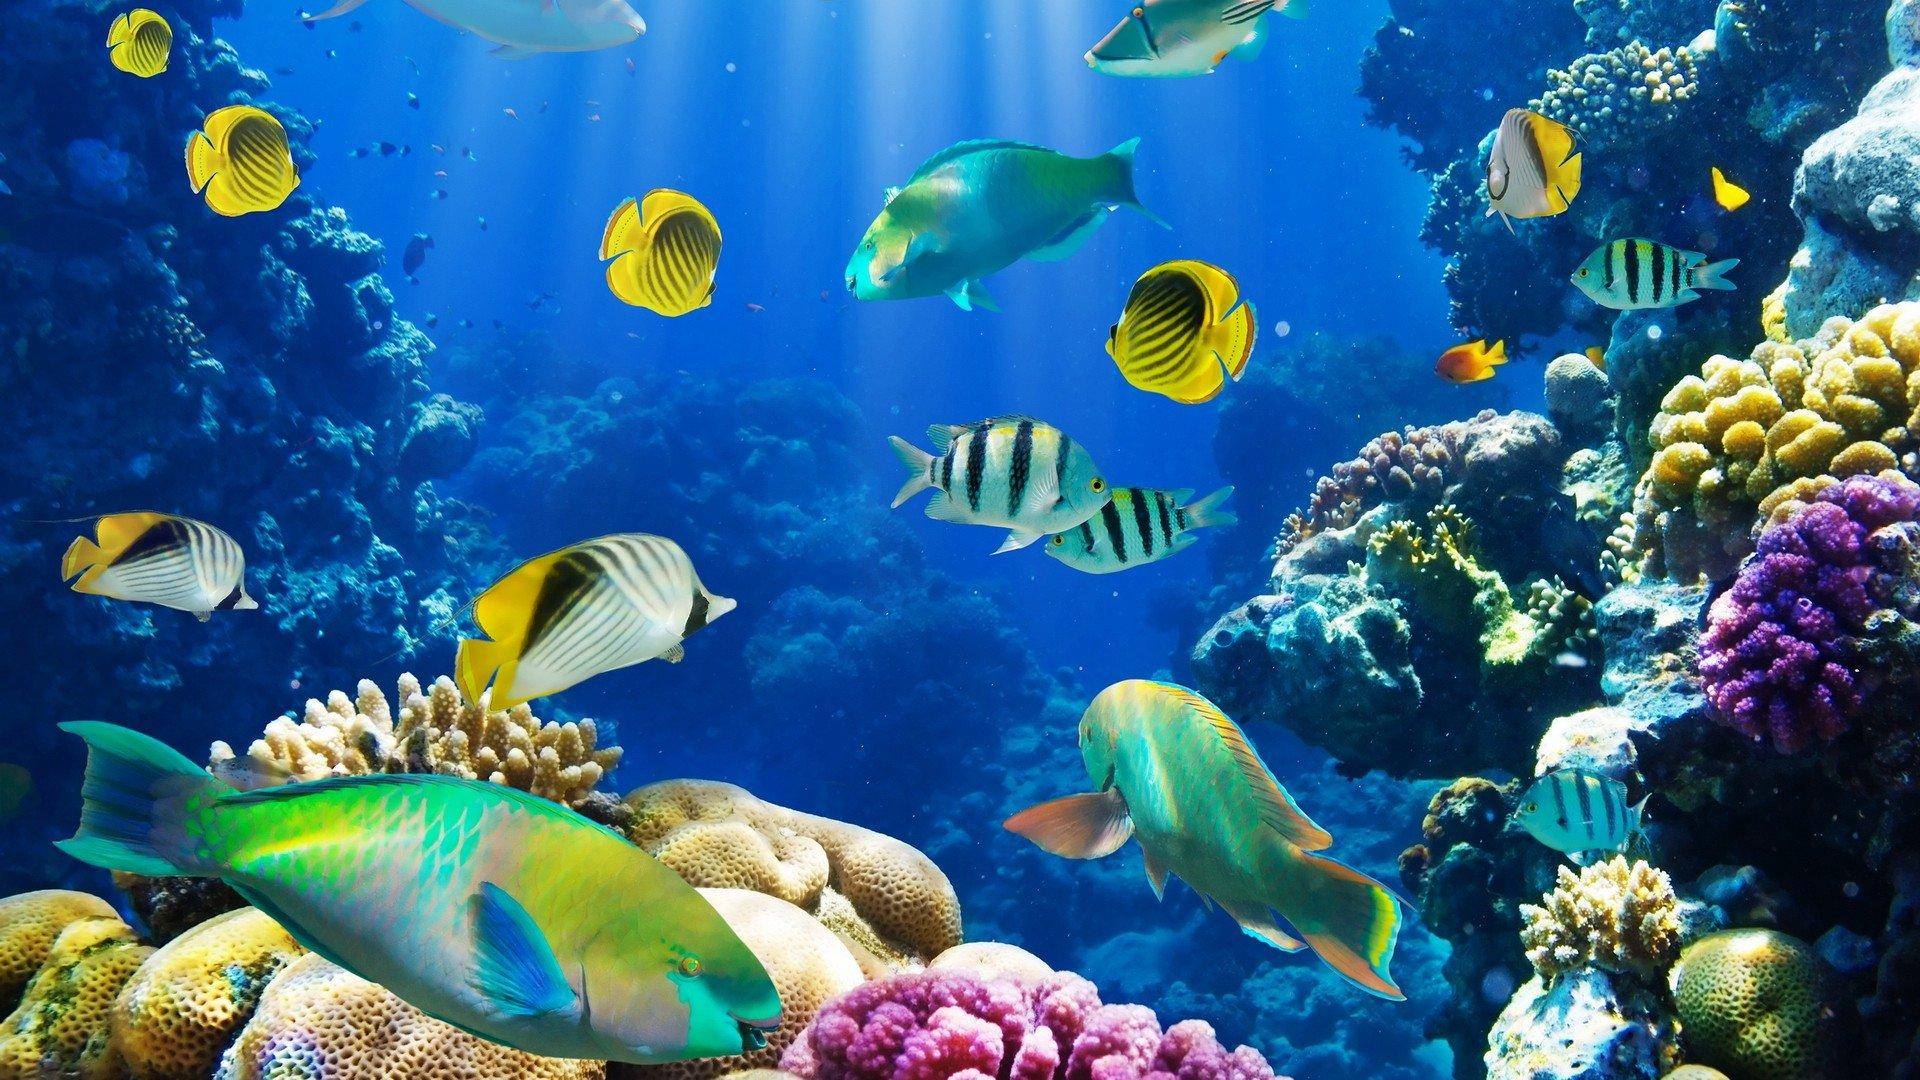 Coral reef wallpaper widescreen